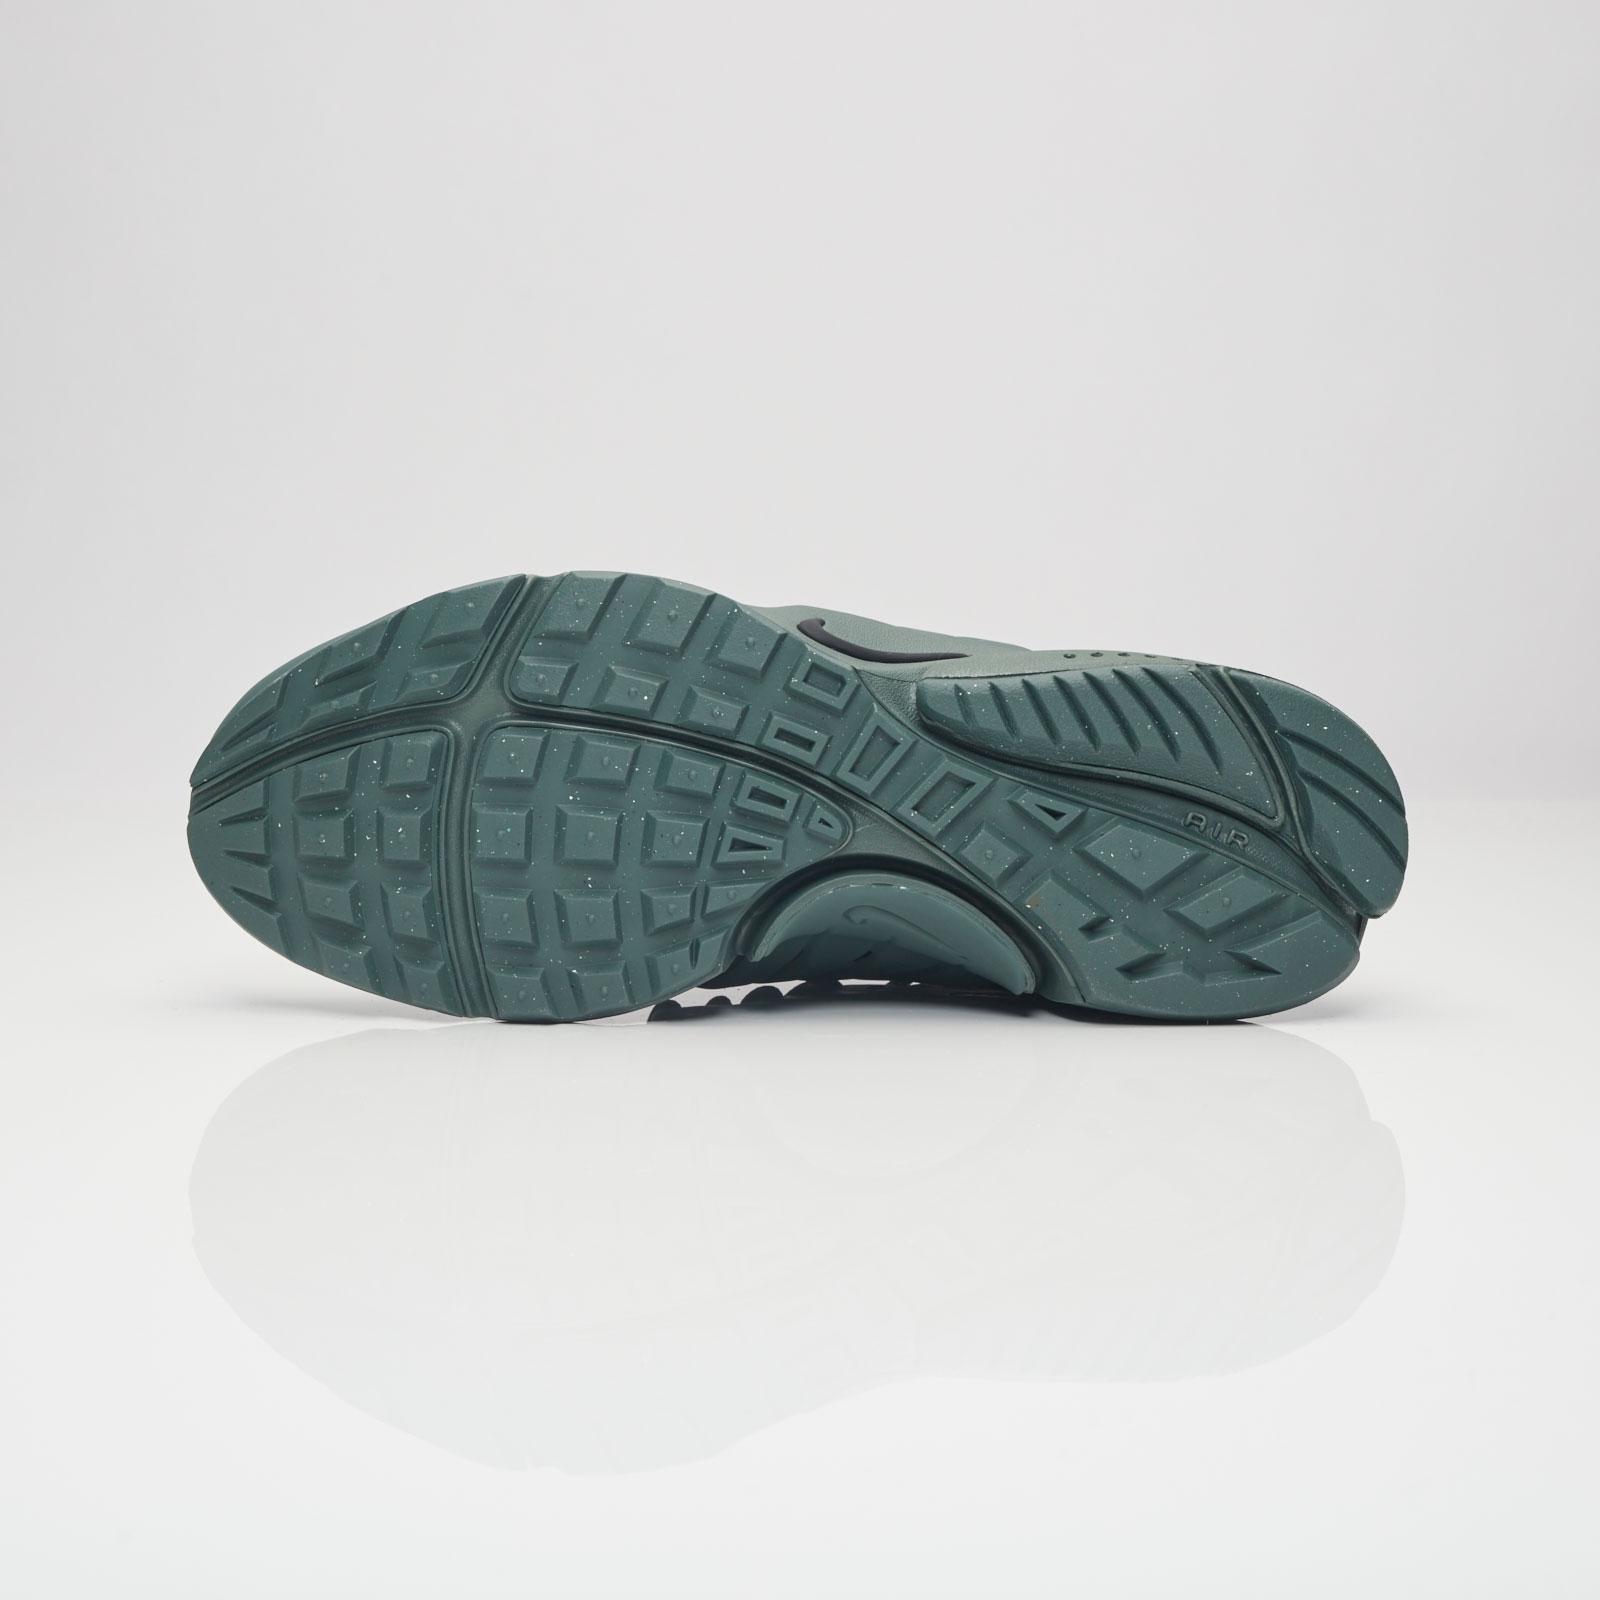 11aff3528eb618 Nike Air Presto Mid SP - Aa0868-003 - Sneakersnstuff